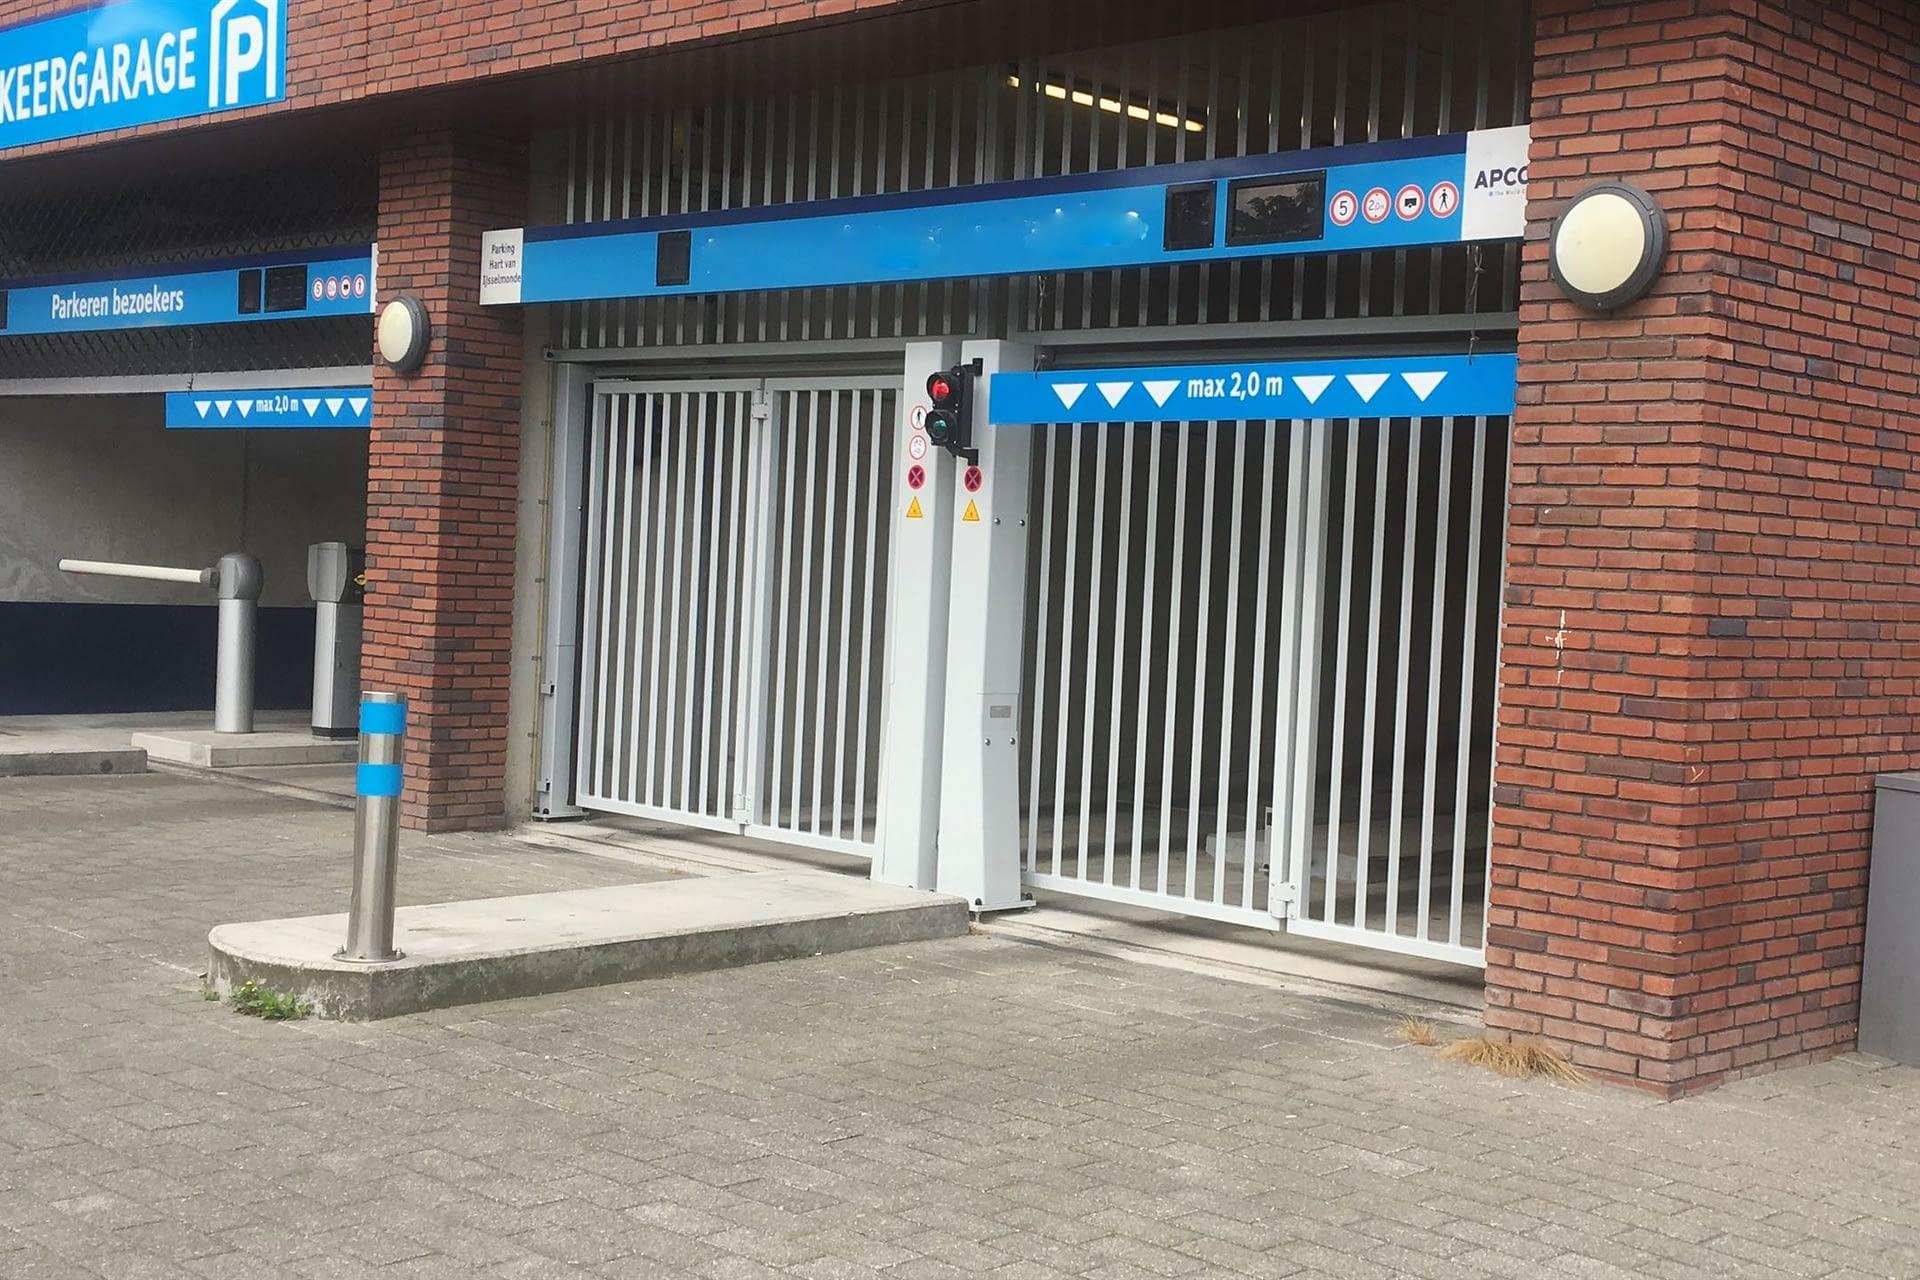 Parking Hoogmonde Rotterdam (1)